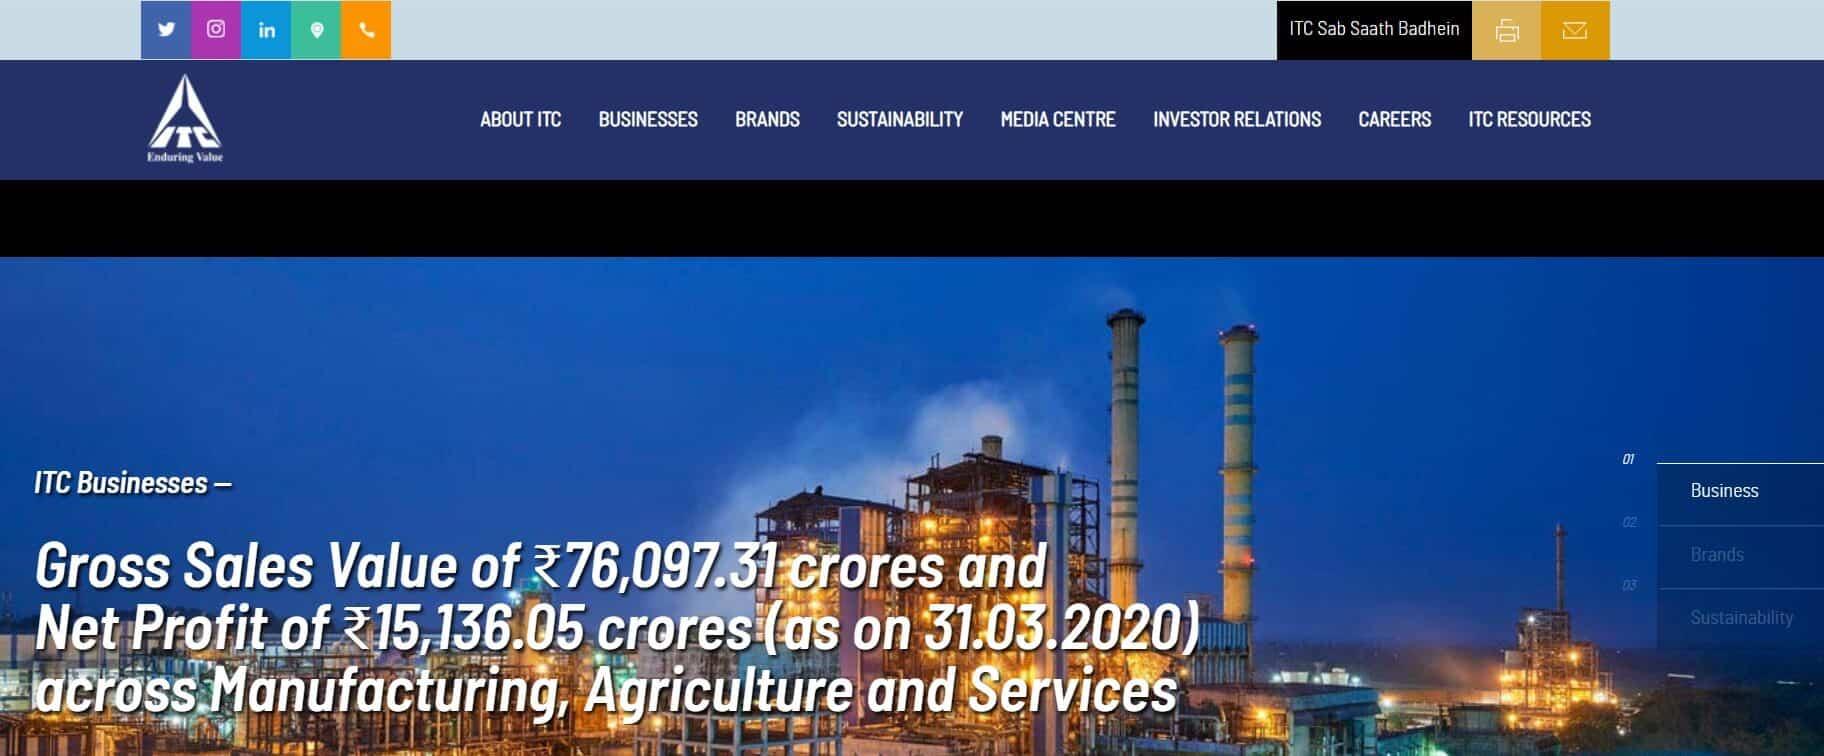 India Tobacco Company(ITC) Limited